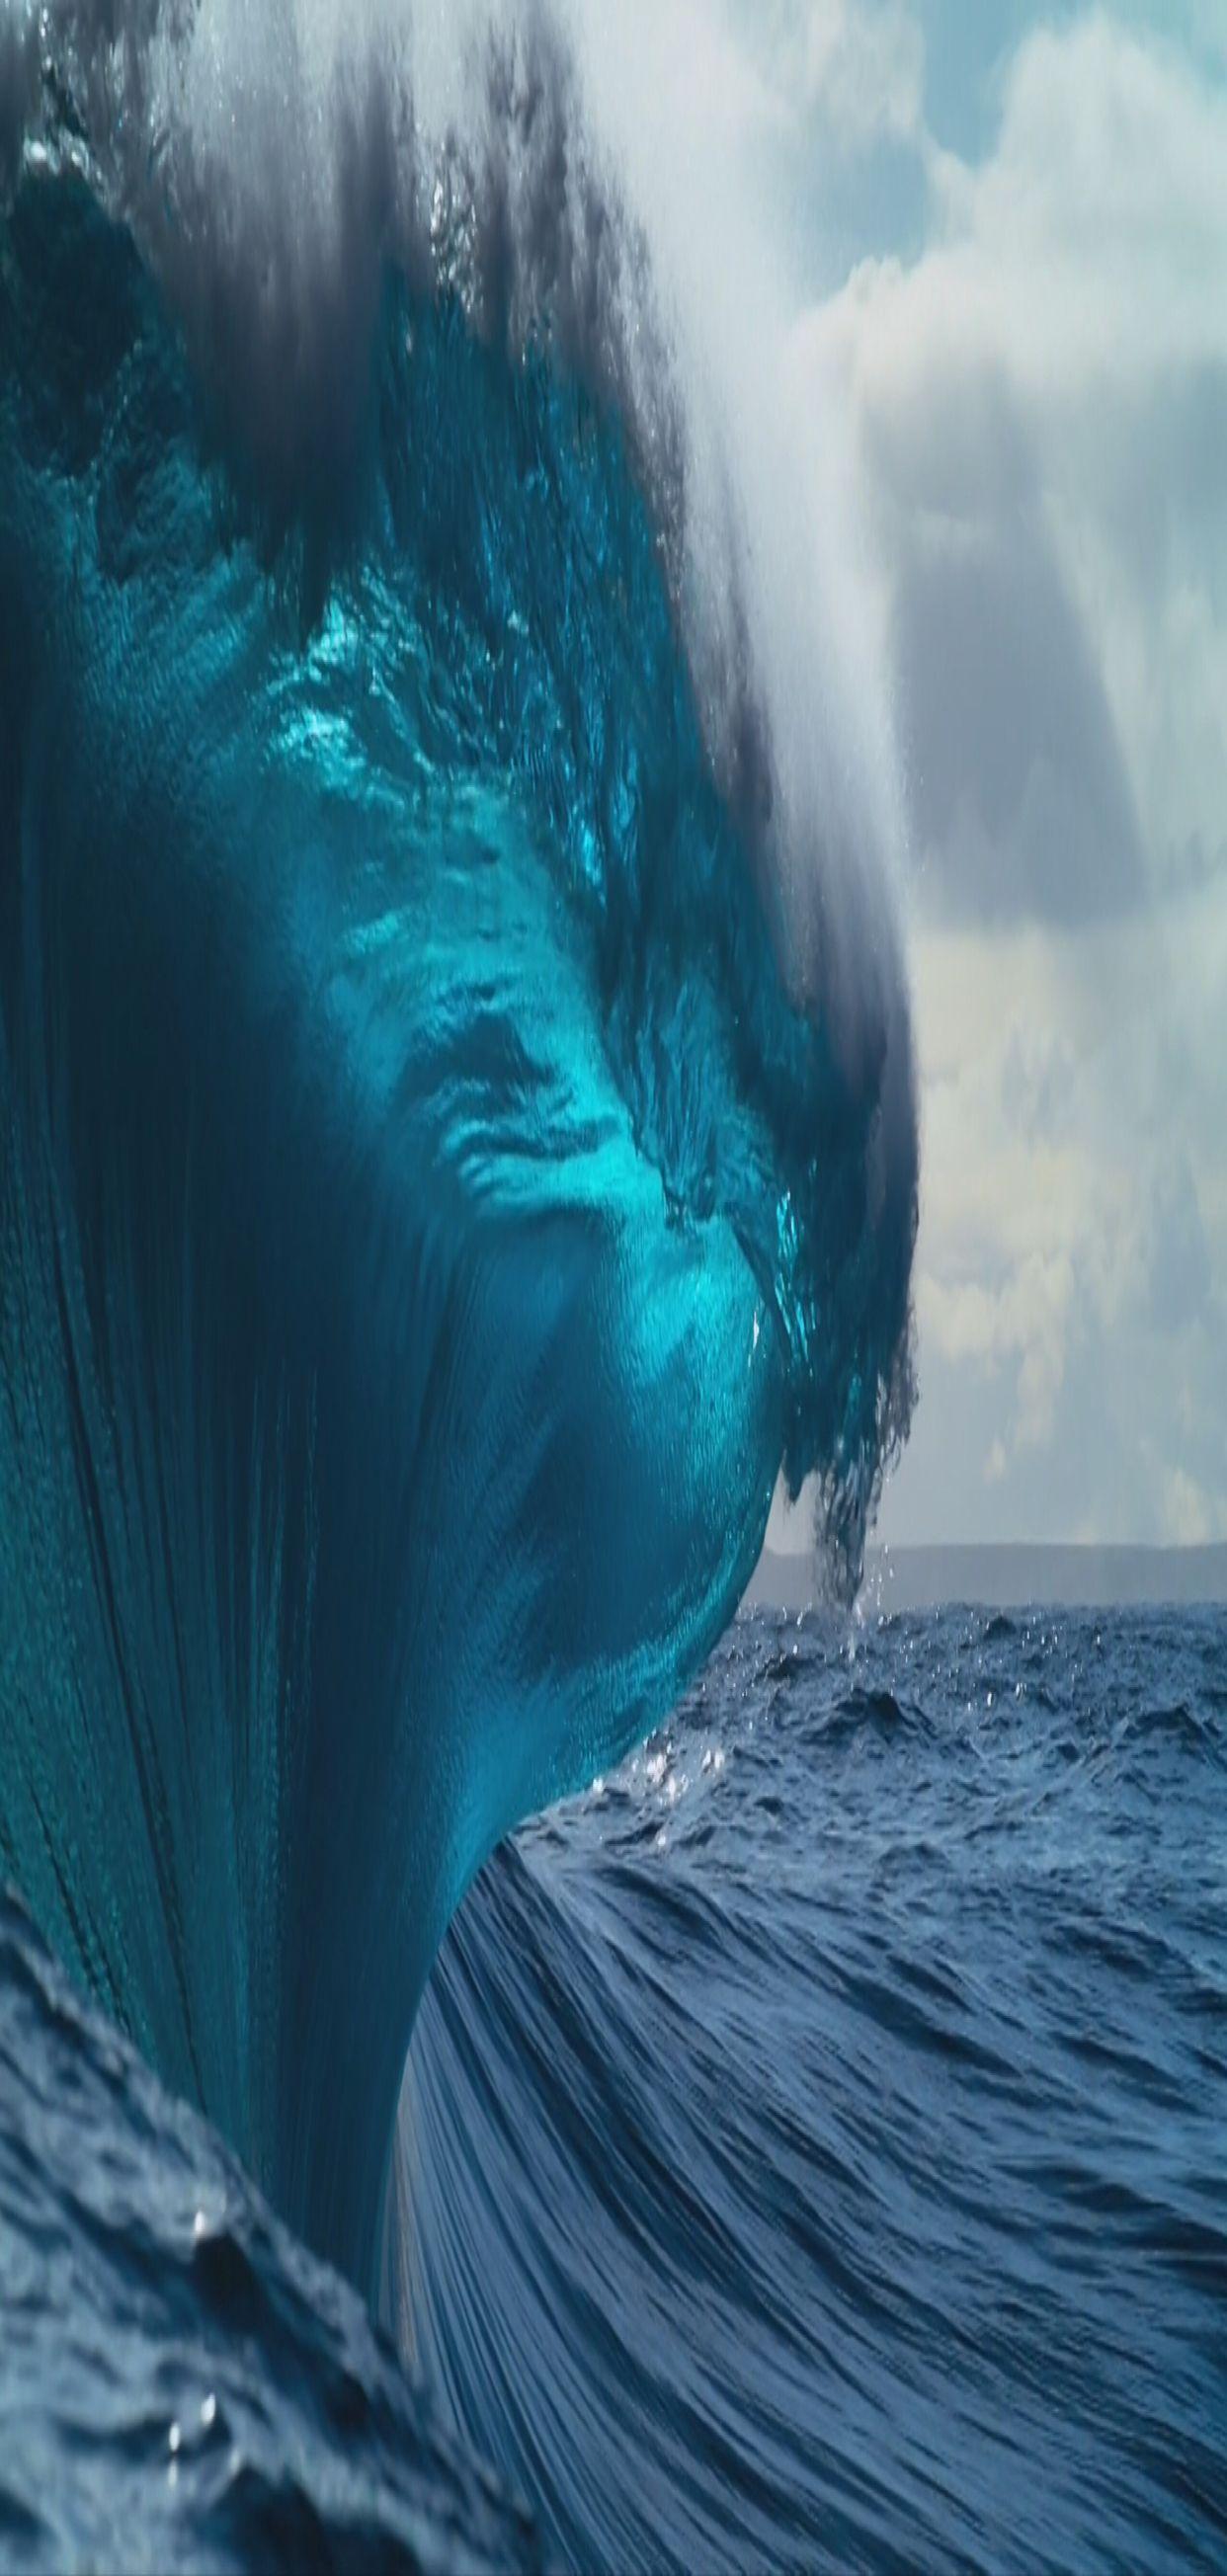 Ios 11 Iphone X Aqua Blue Water Underwater Wave Ocean Apple Wallpaper Iphone 8 Clean Beauty Colour Blue Planet Ii Ocean Wallpaper Ios 11 Wallpaper